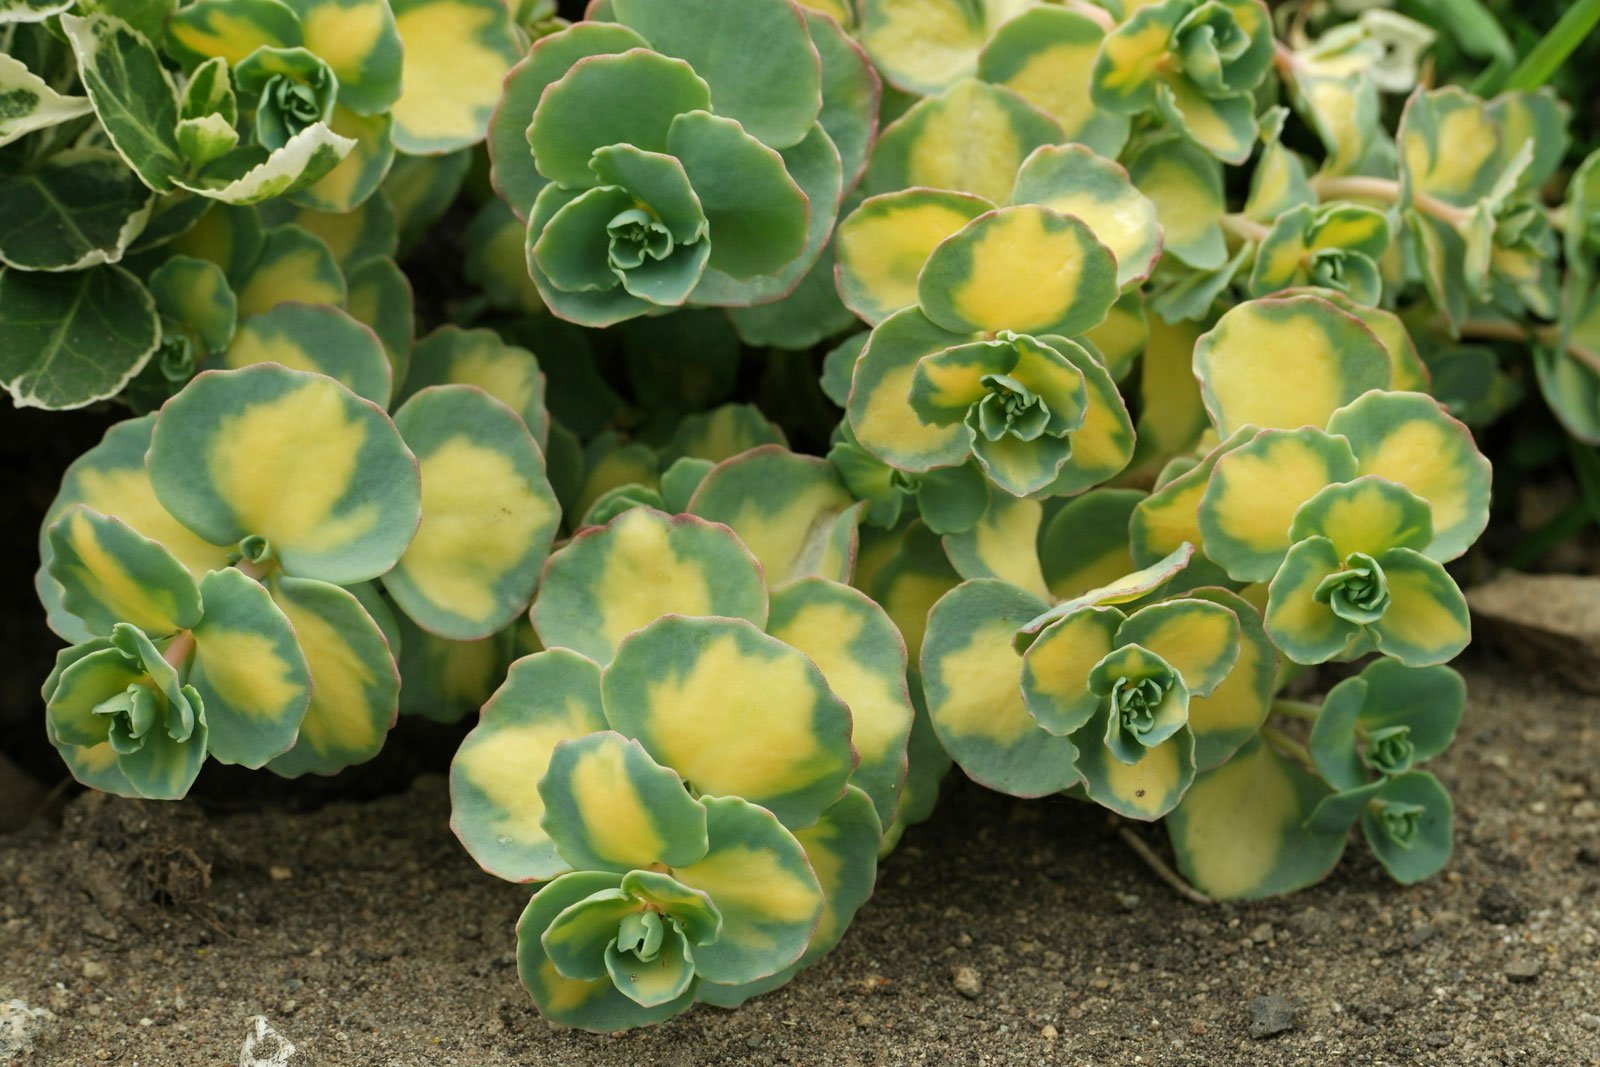 Hylotelephium sieboldii Mediovariegatum